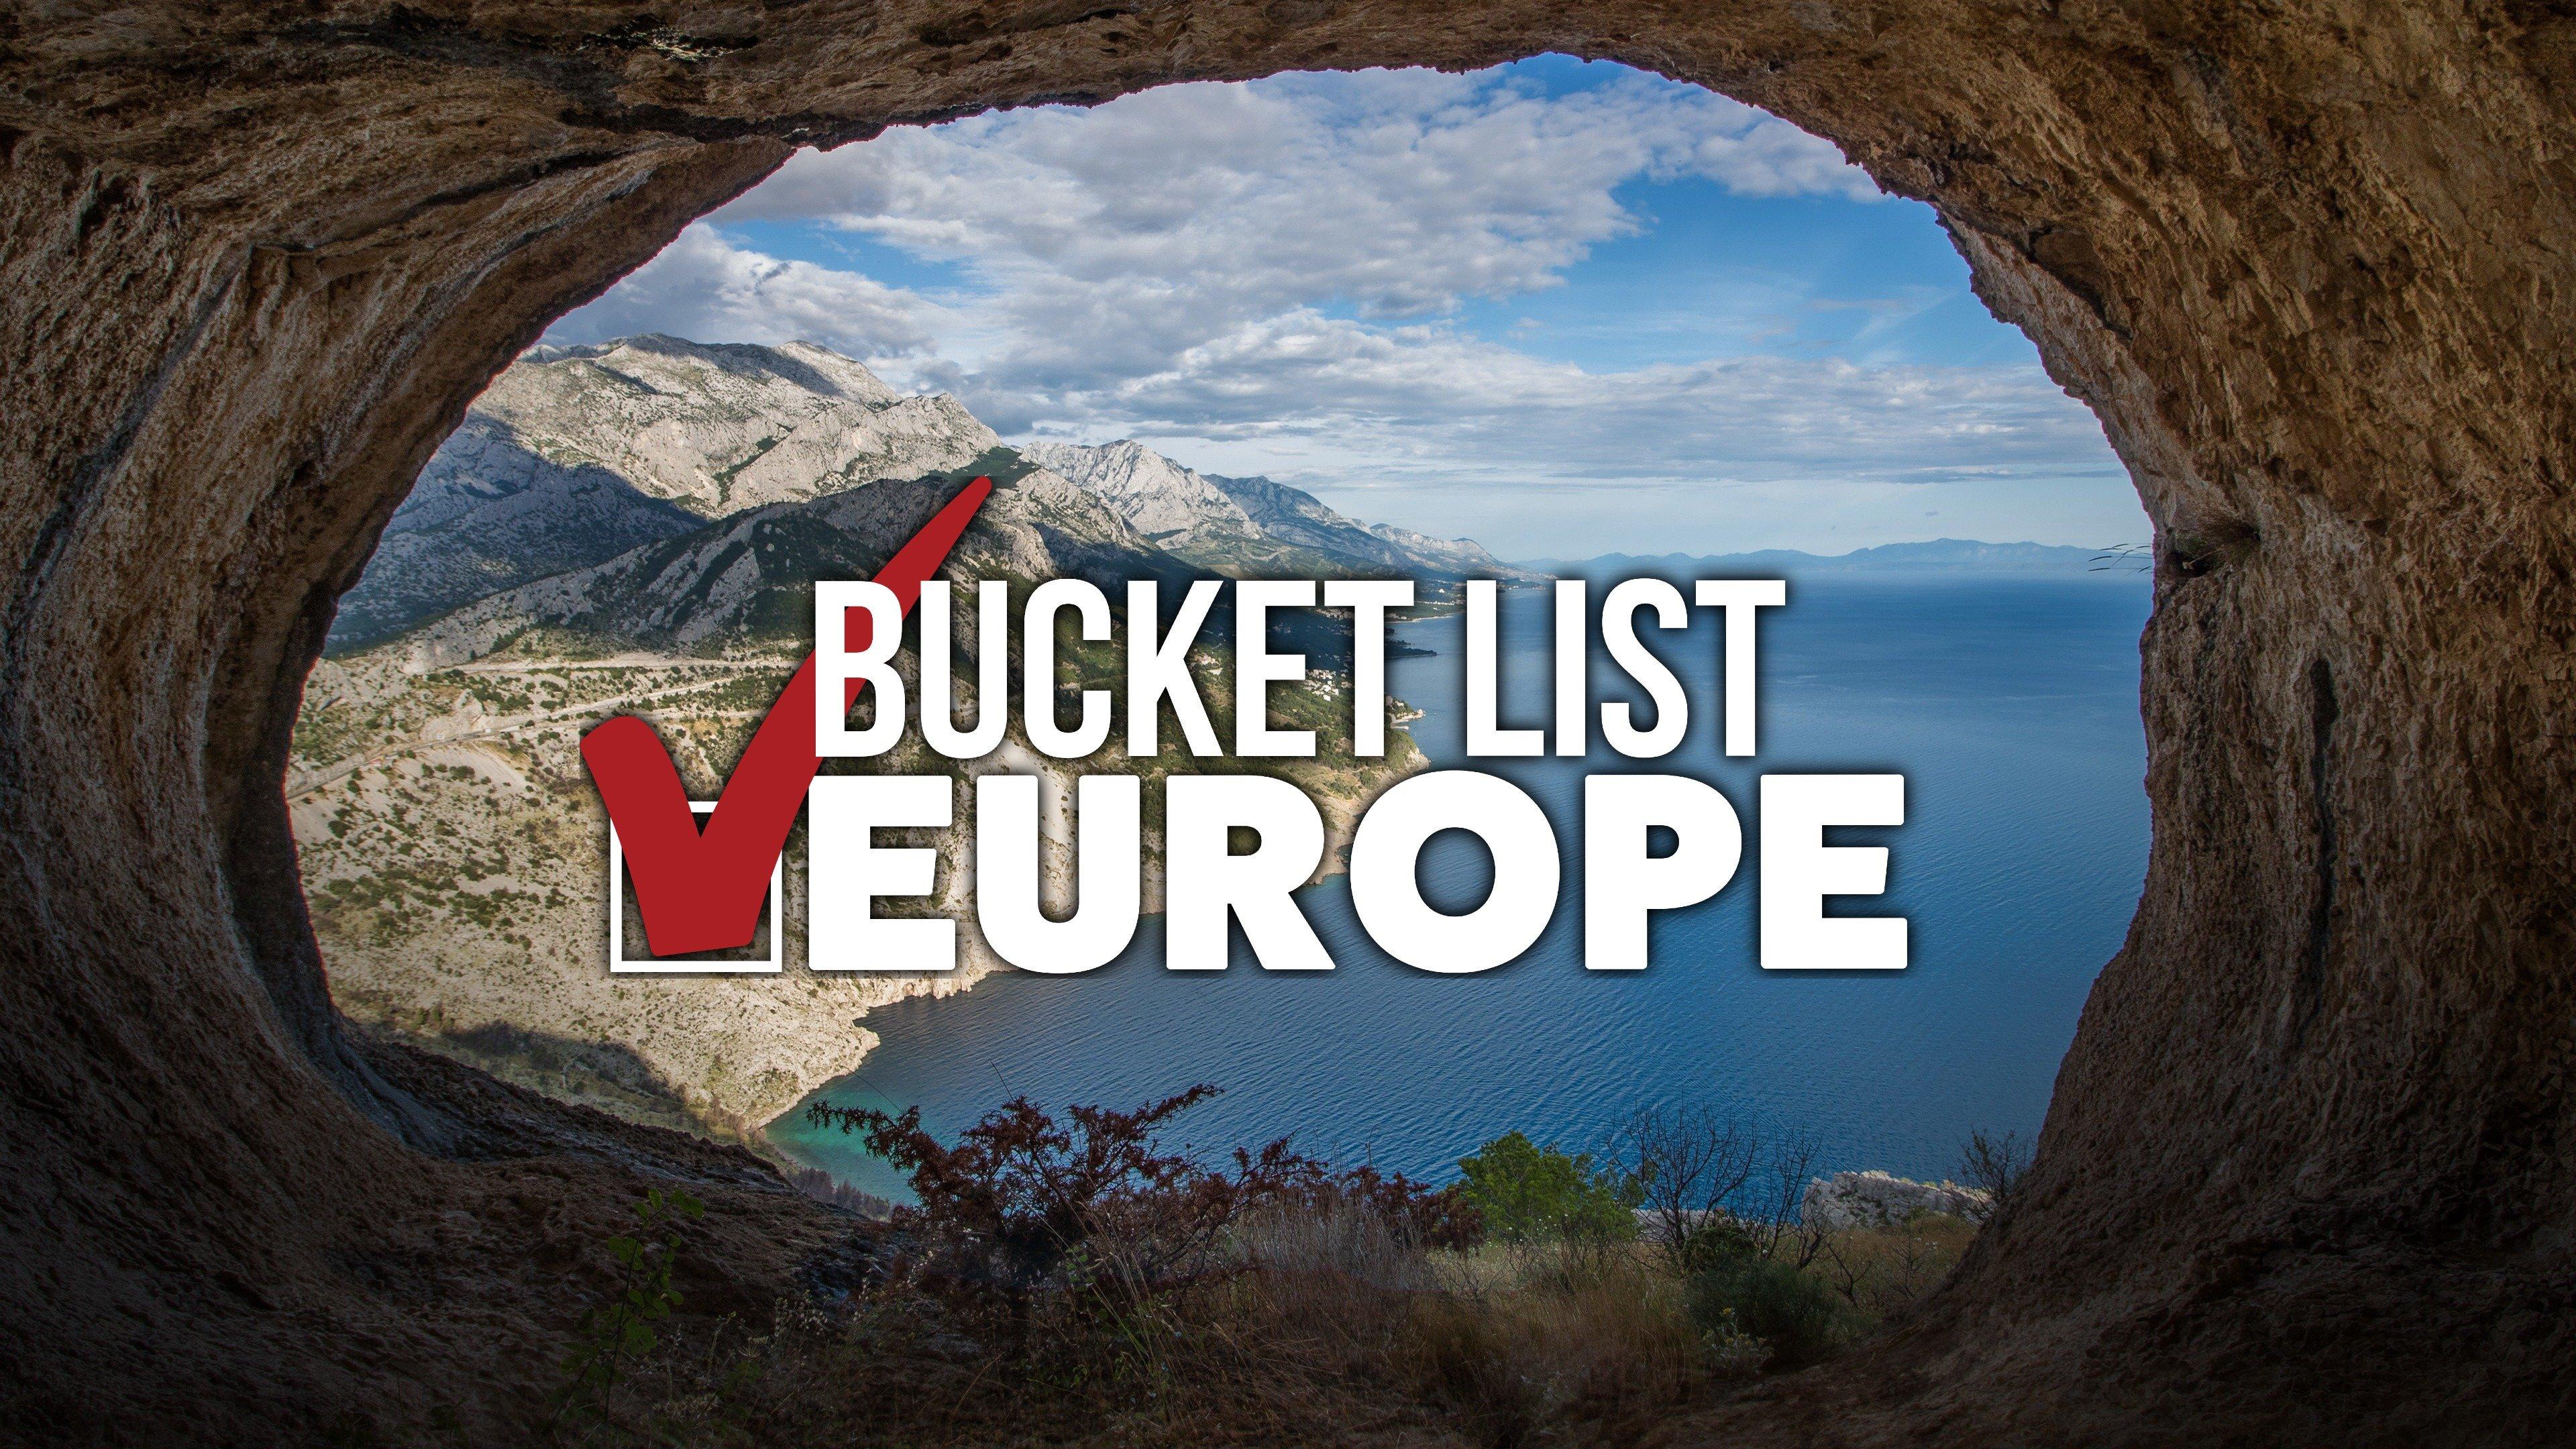 Bucket List Europe